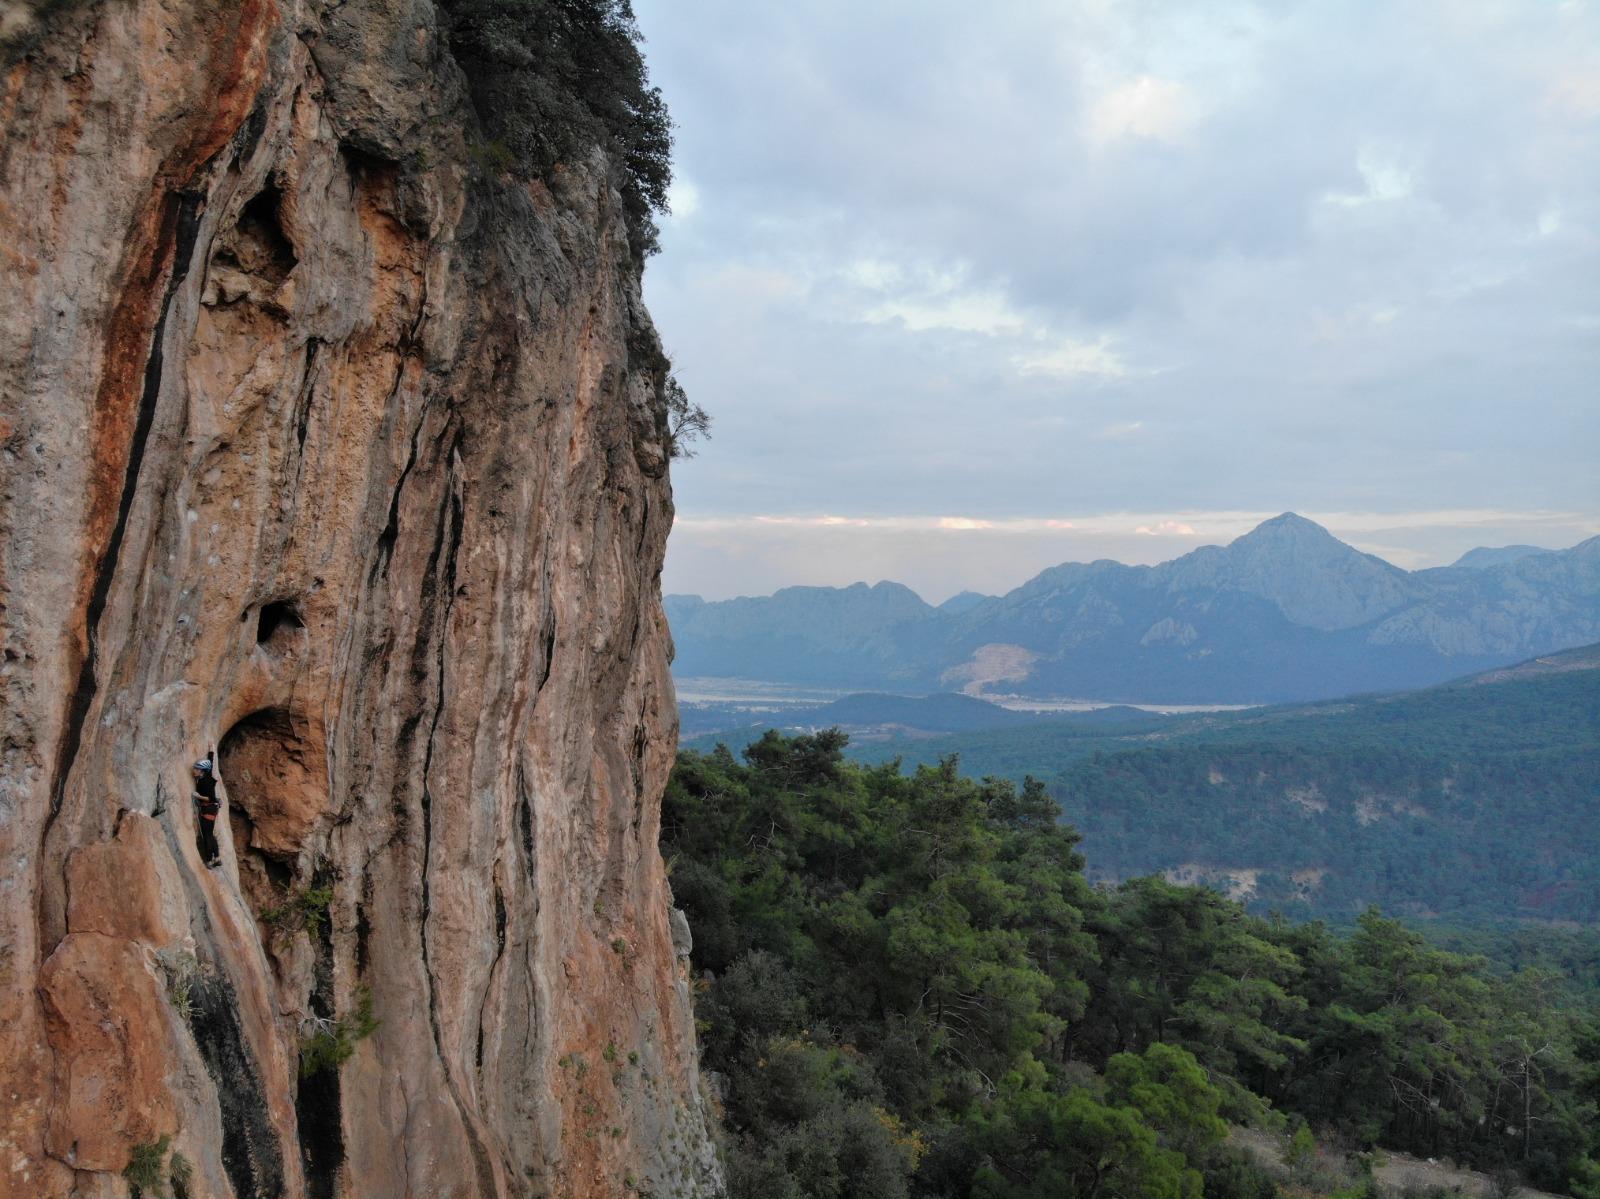 Antalya Geyikbayırı Kaya Tırmanışı